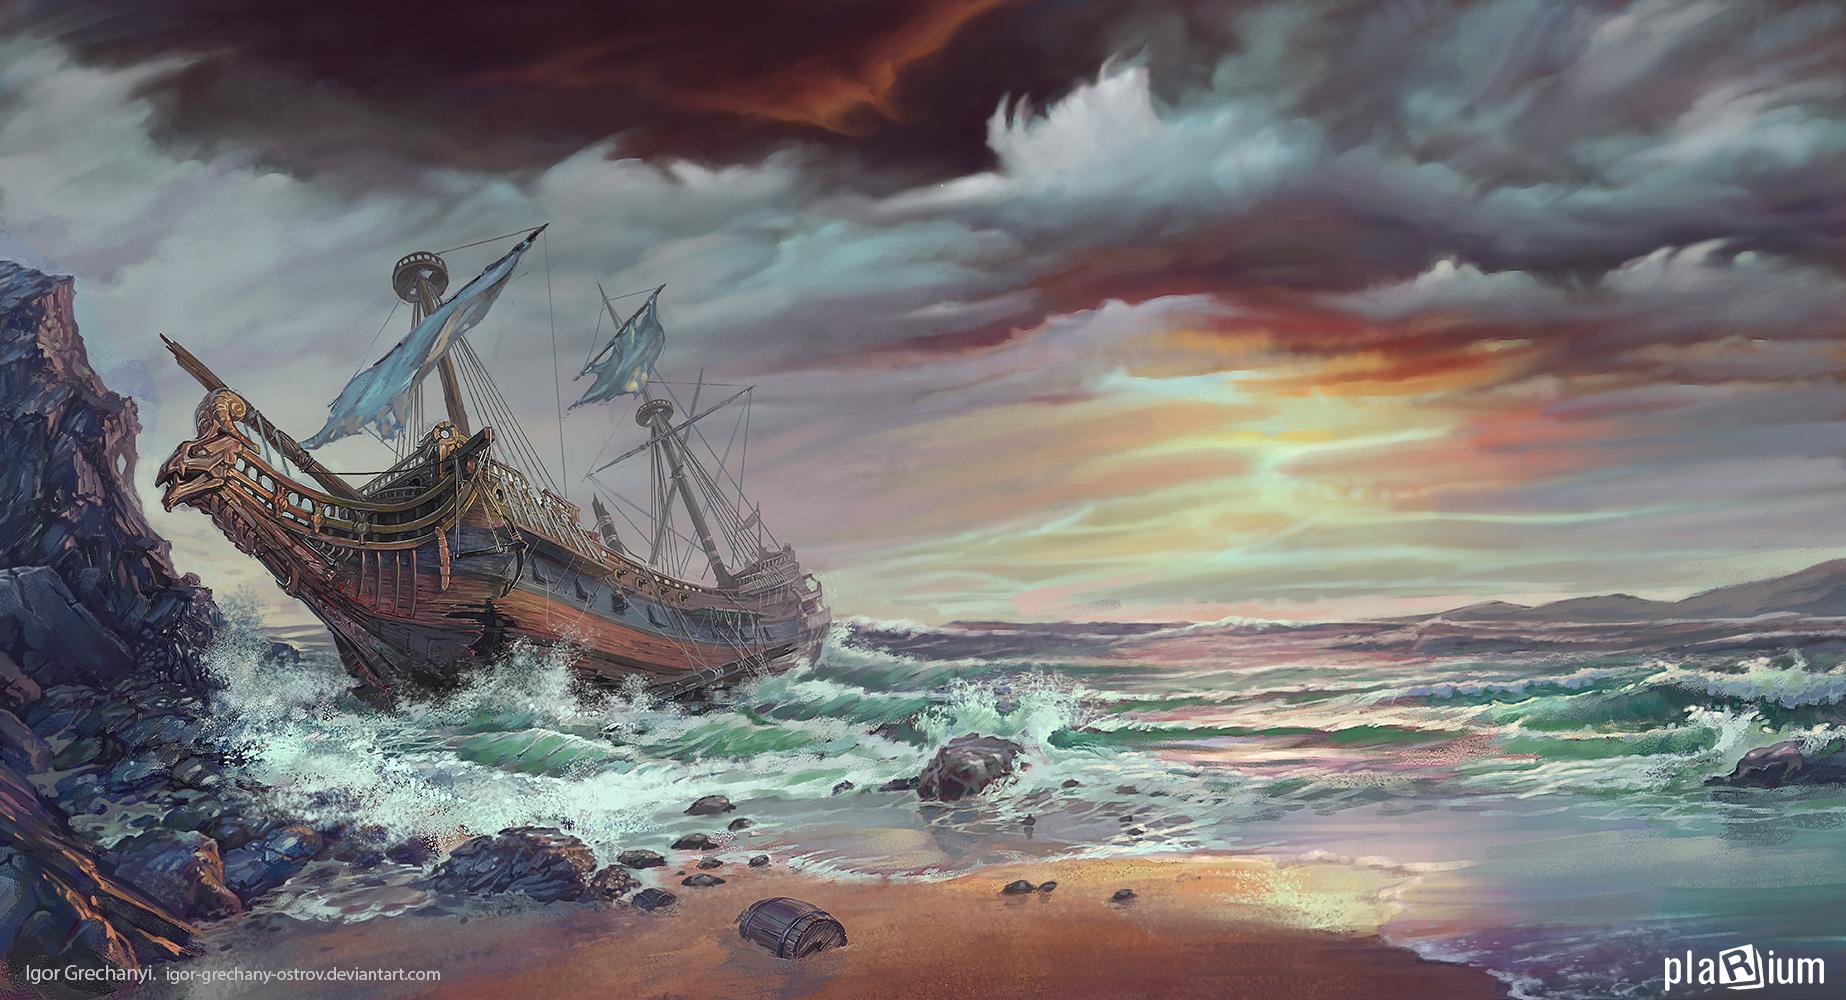 Shipwreck by Igor-Grechany-Ostrov